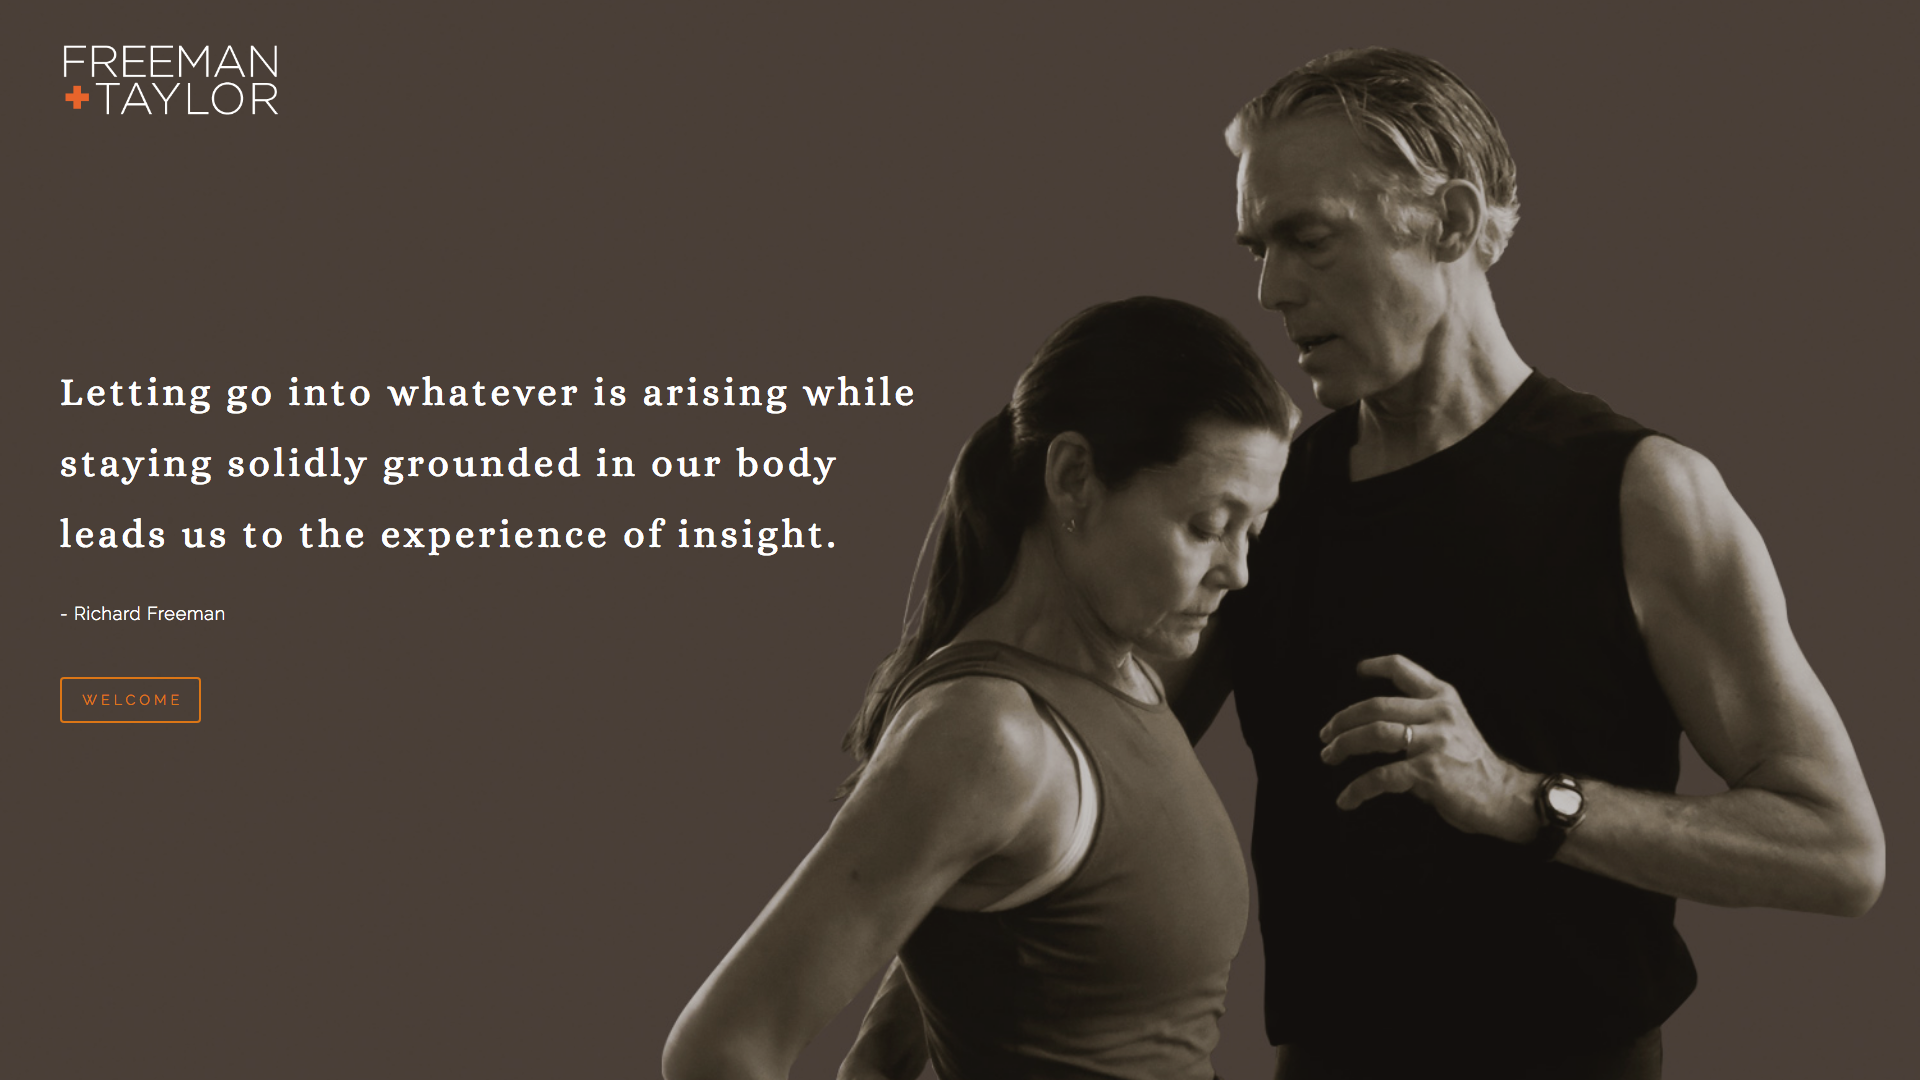 Freeman + Taylor Yoga